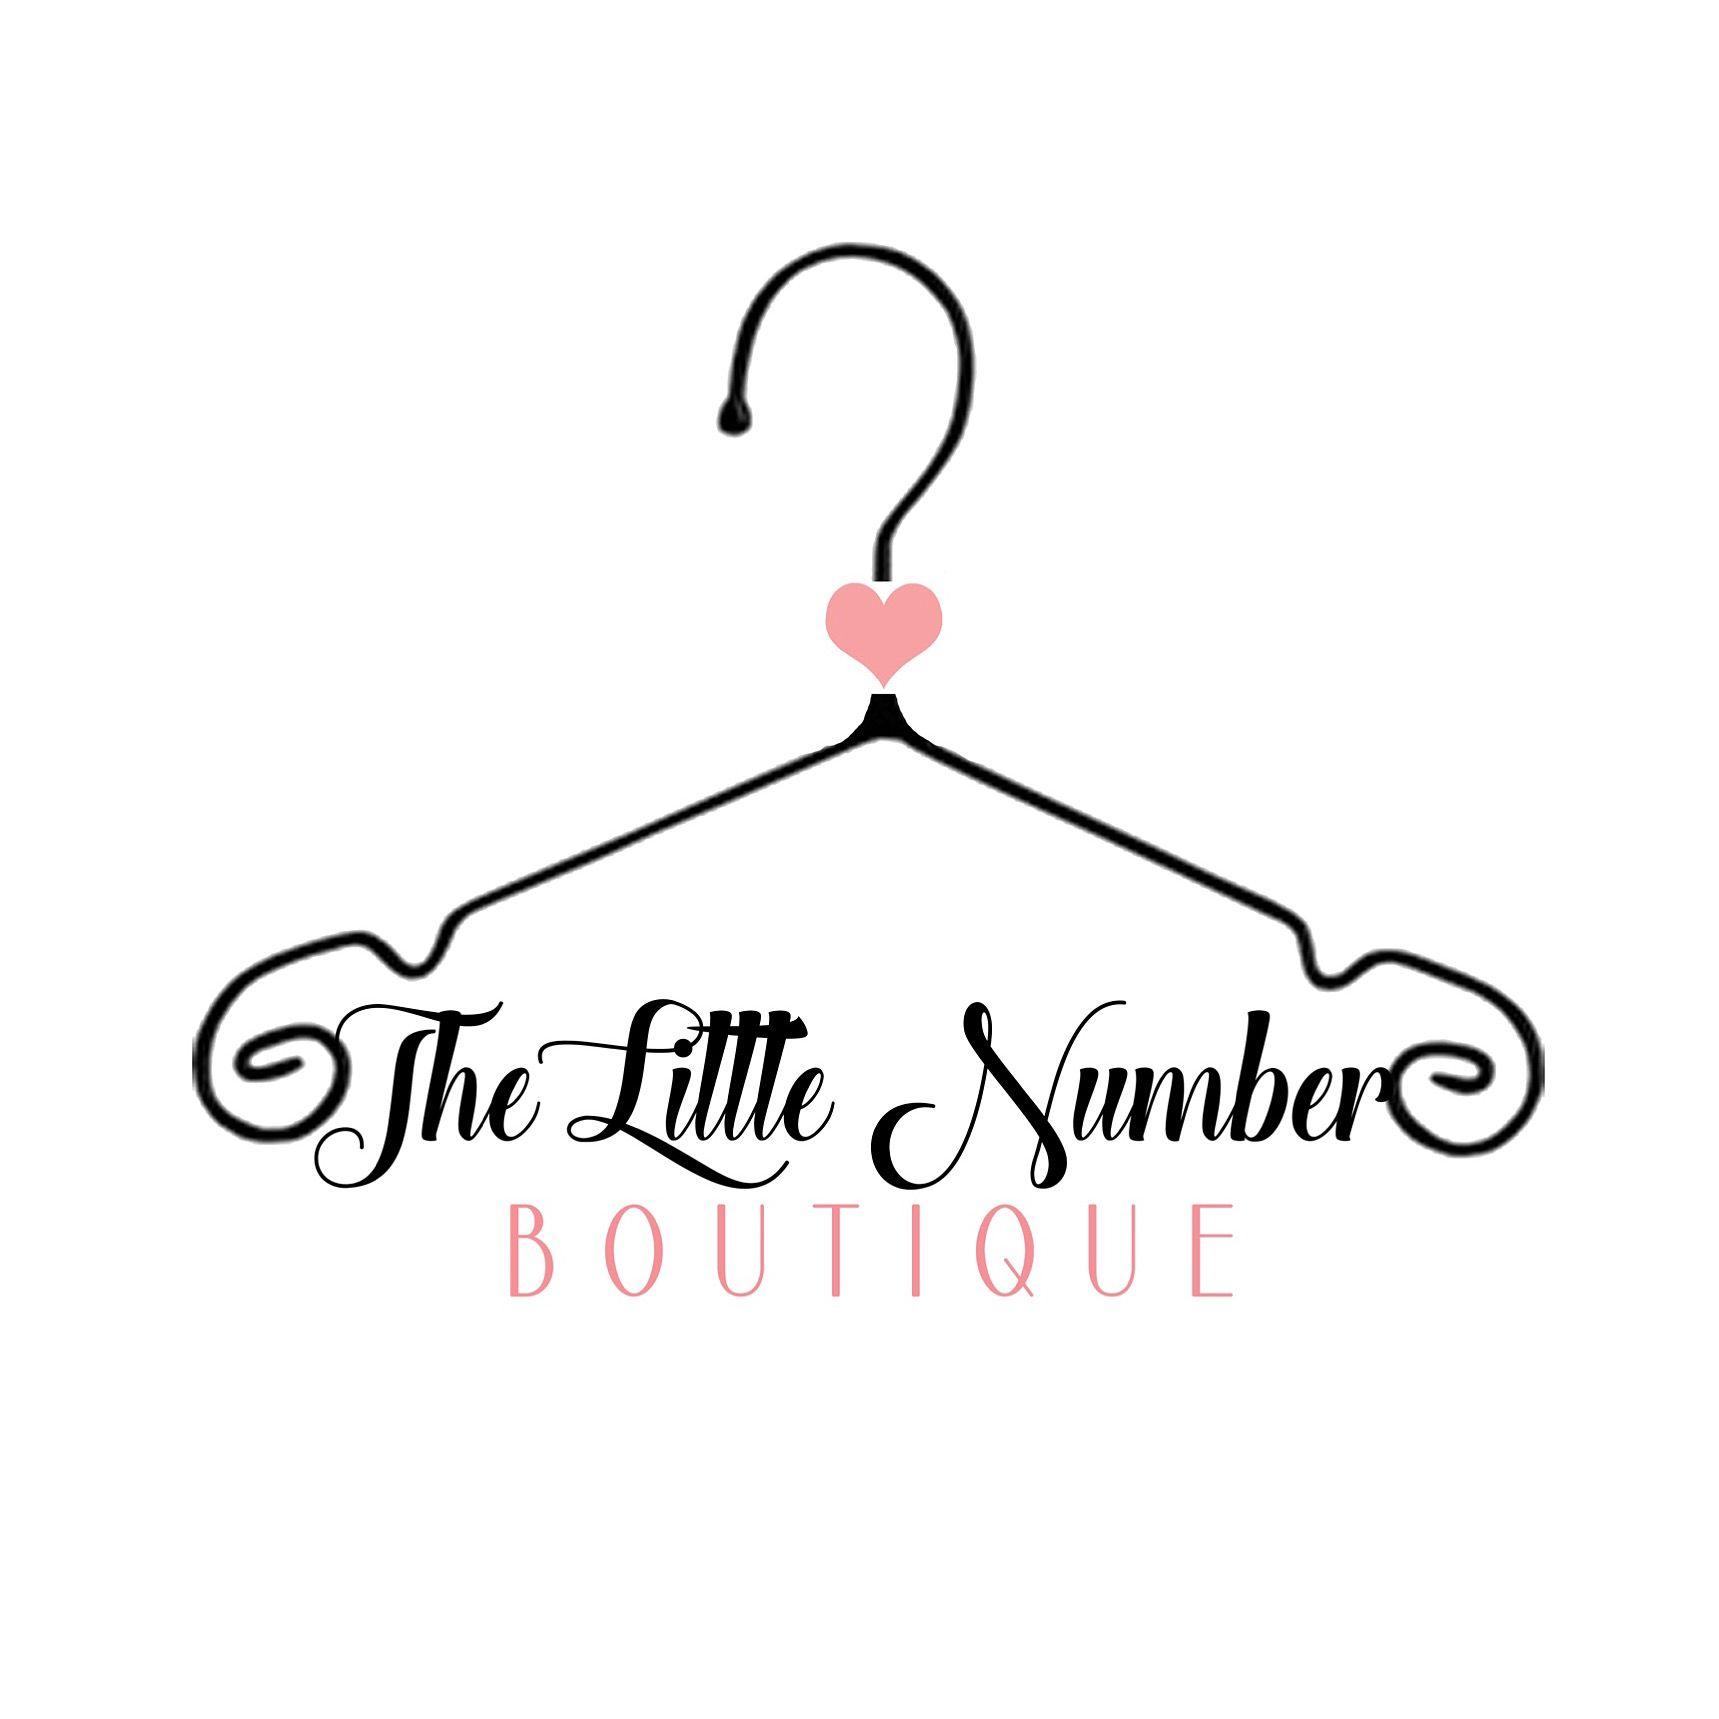 logo bespoke boutique Logotipo de loja, Ideias para